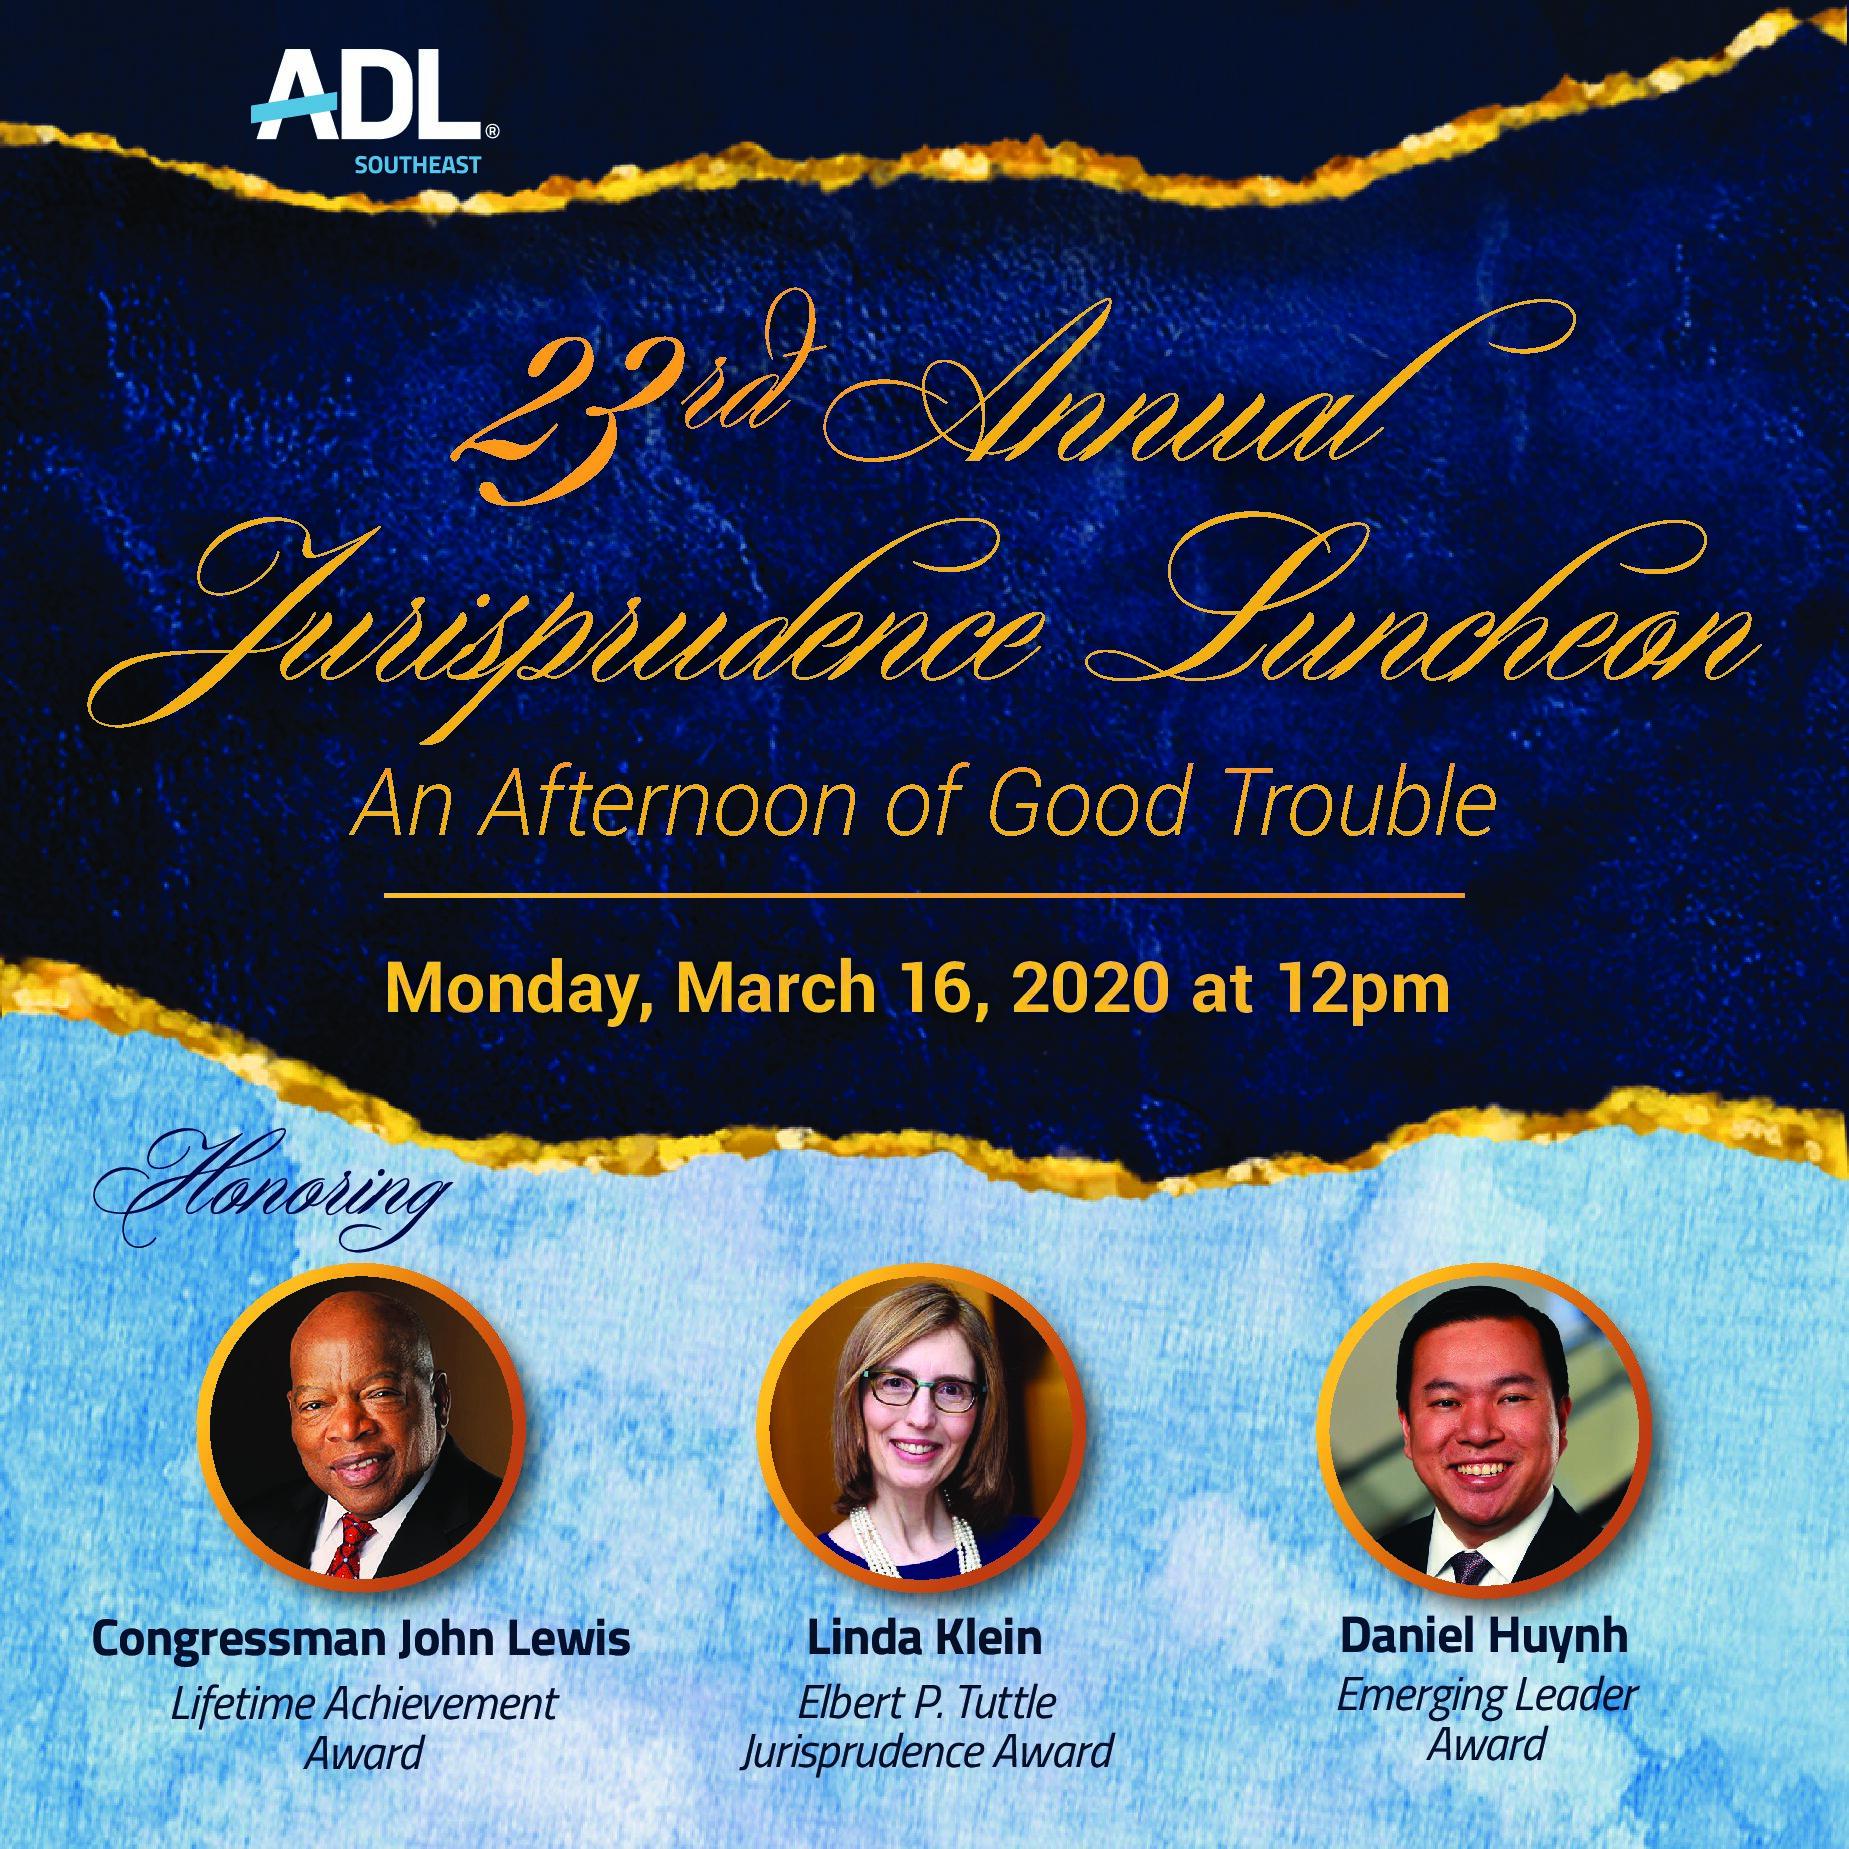 ADL-015 2020 Jurisprudence Luncheon 1040x1040 V2